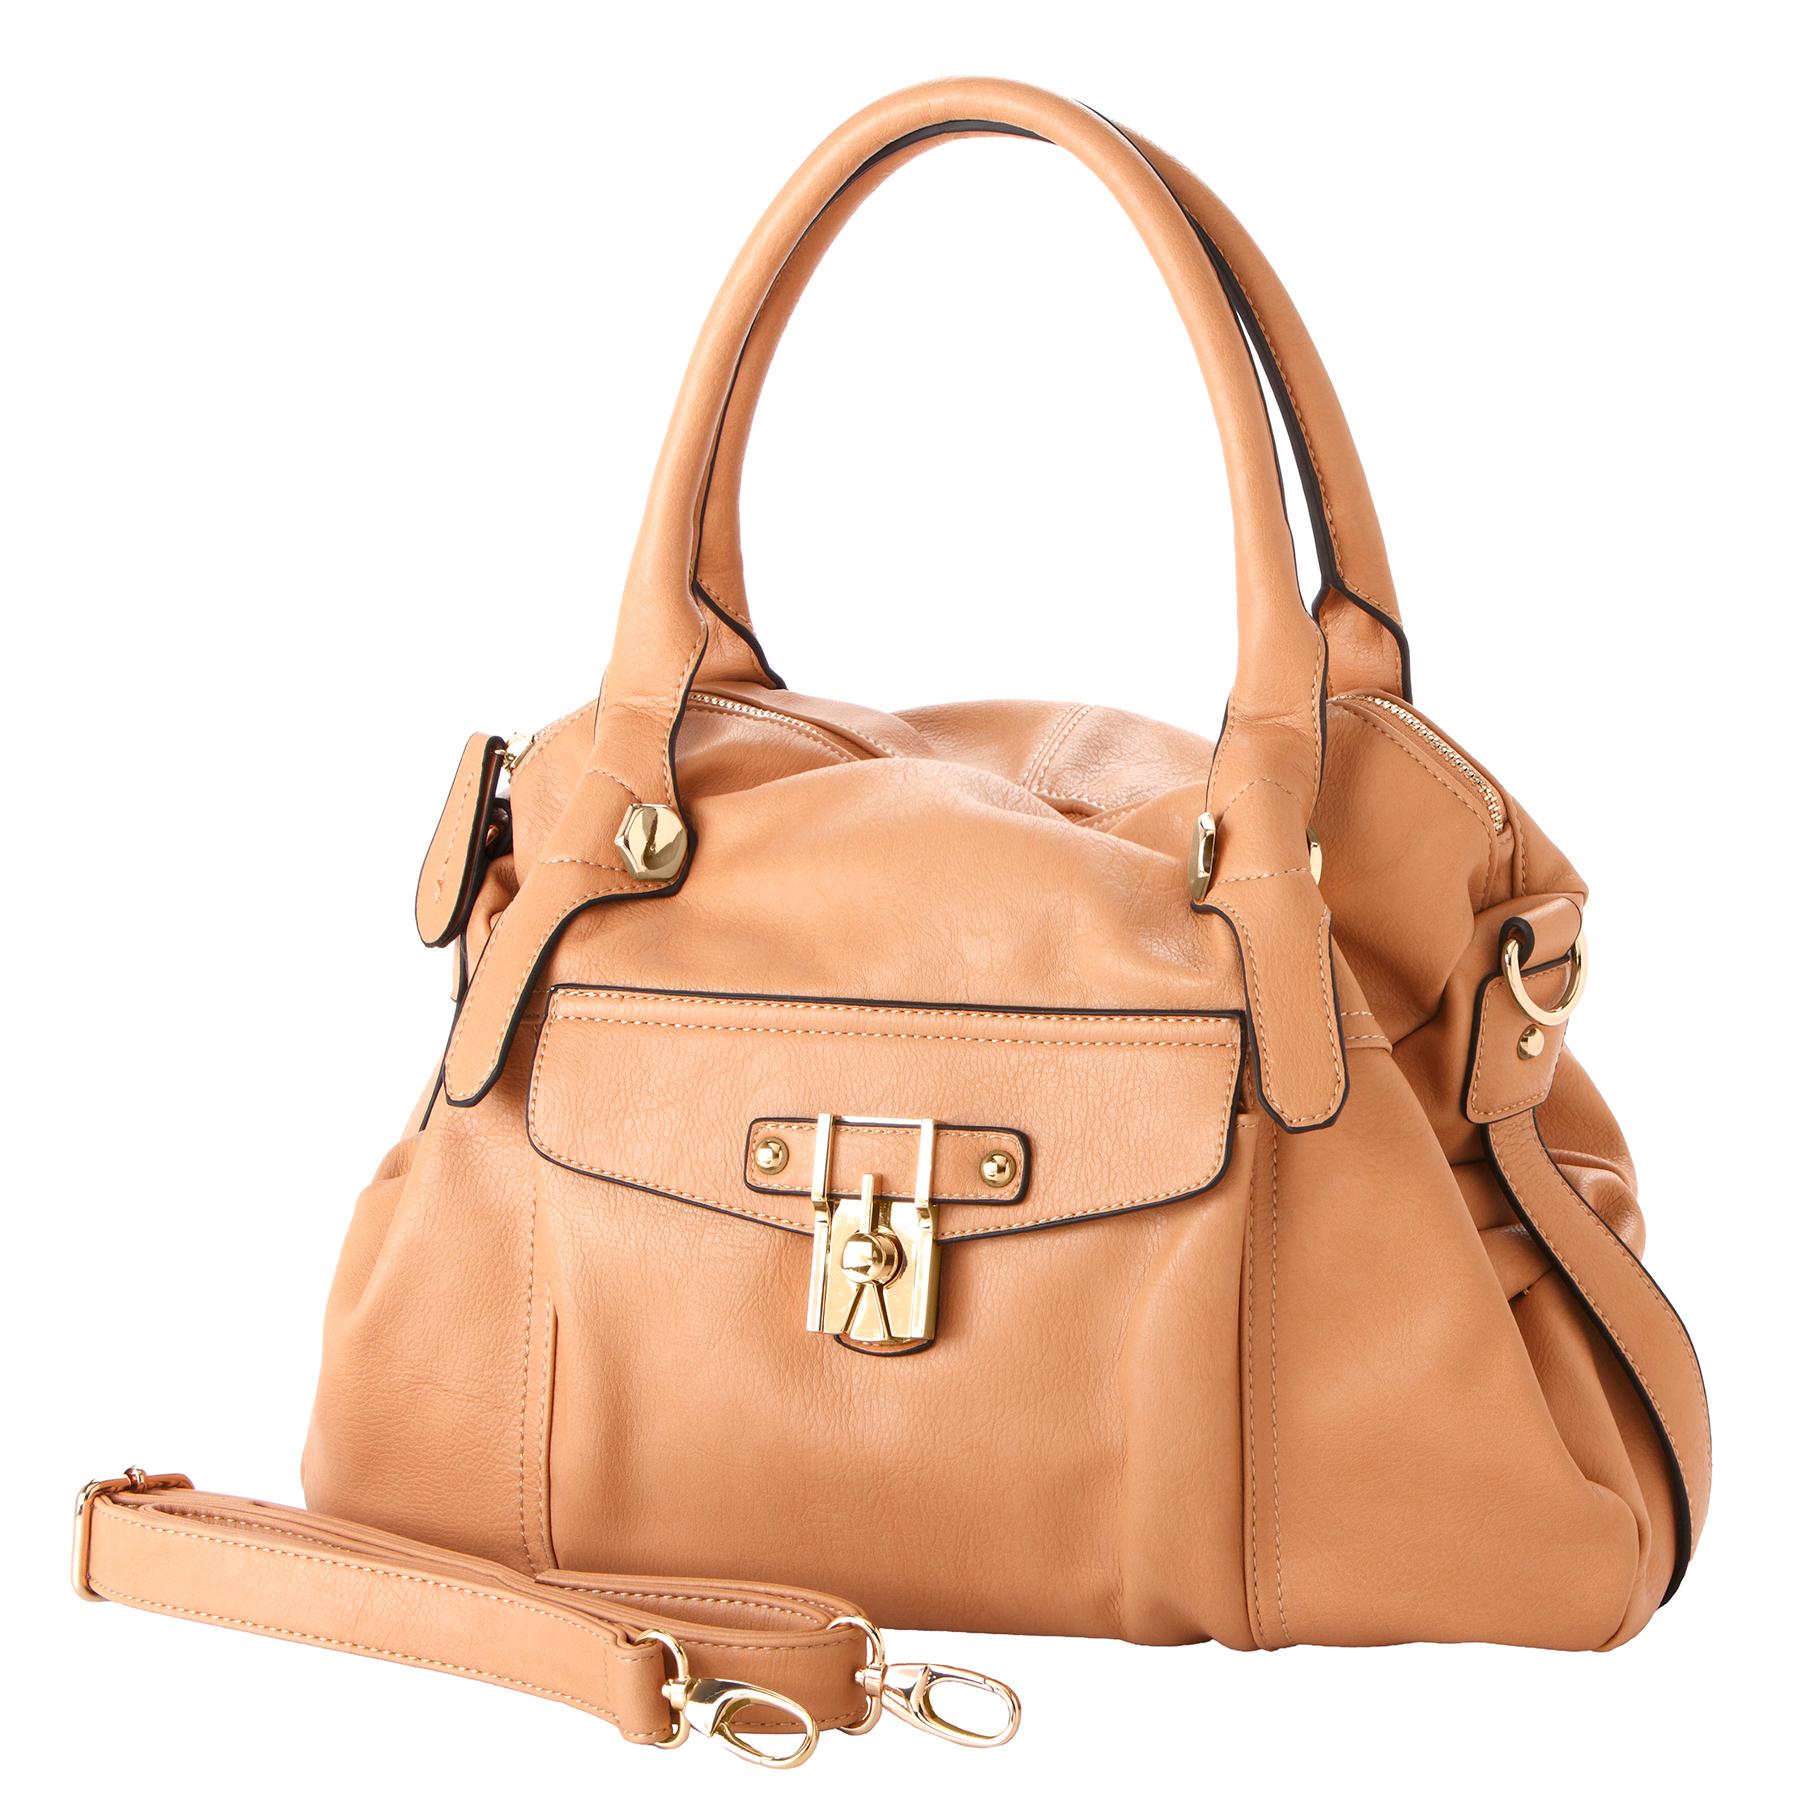 CAME Apricot Office Tote Style Satchel Handbag main